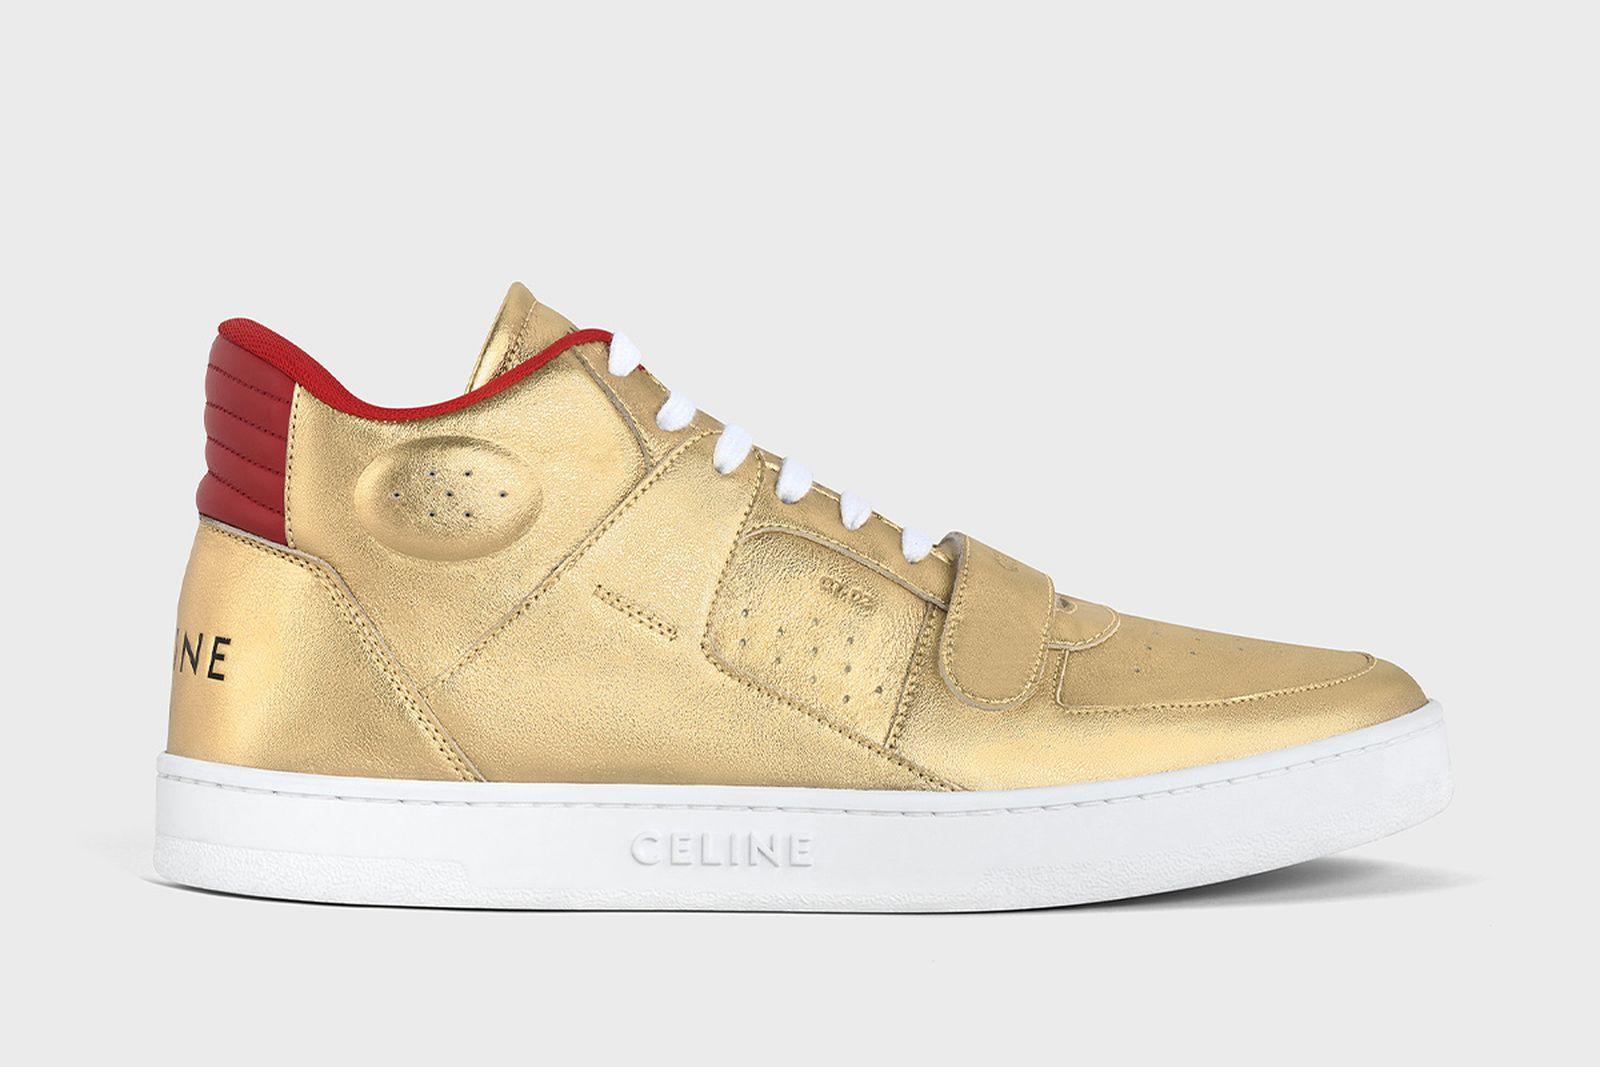 celine-trainer-1-release-date-price-18